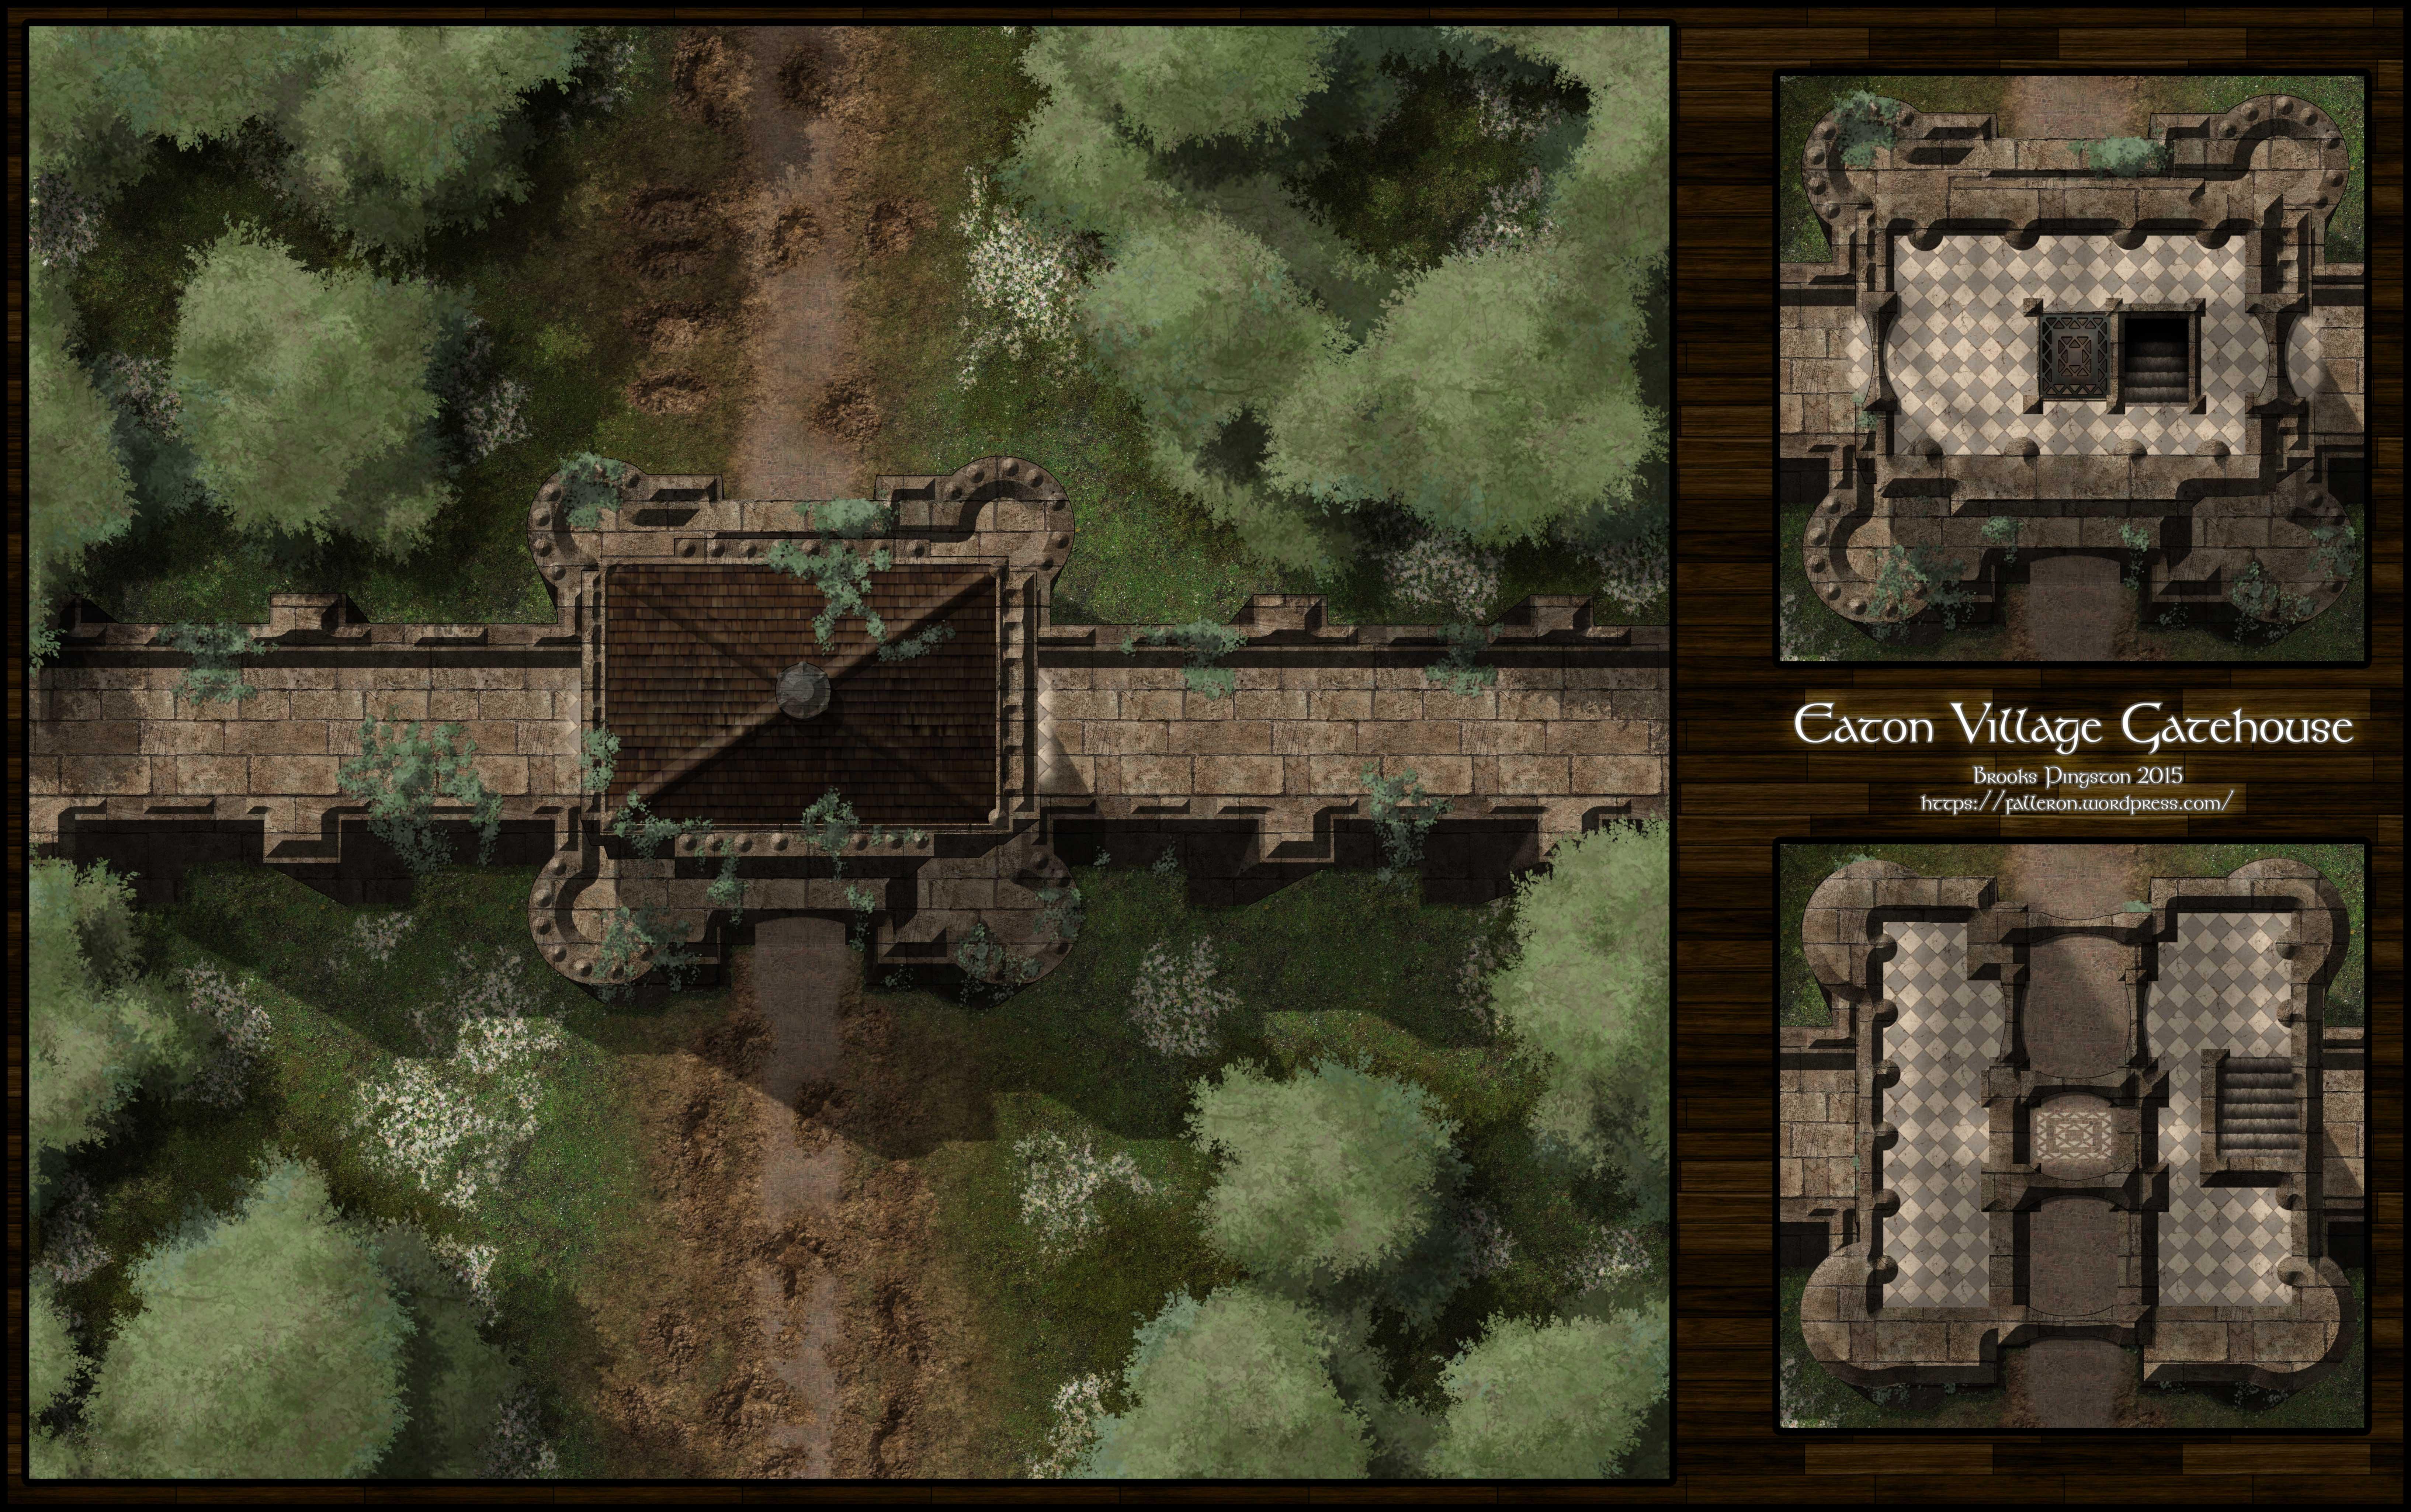 eaton-village-gatehouse.jpg